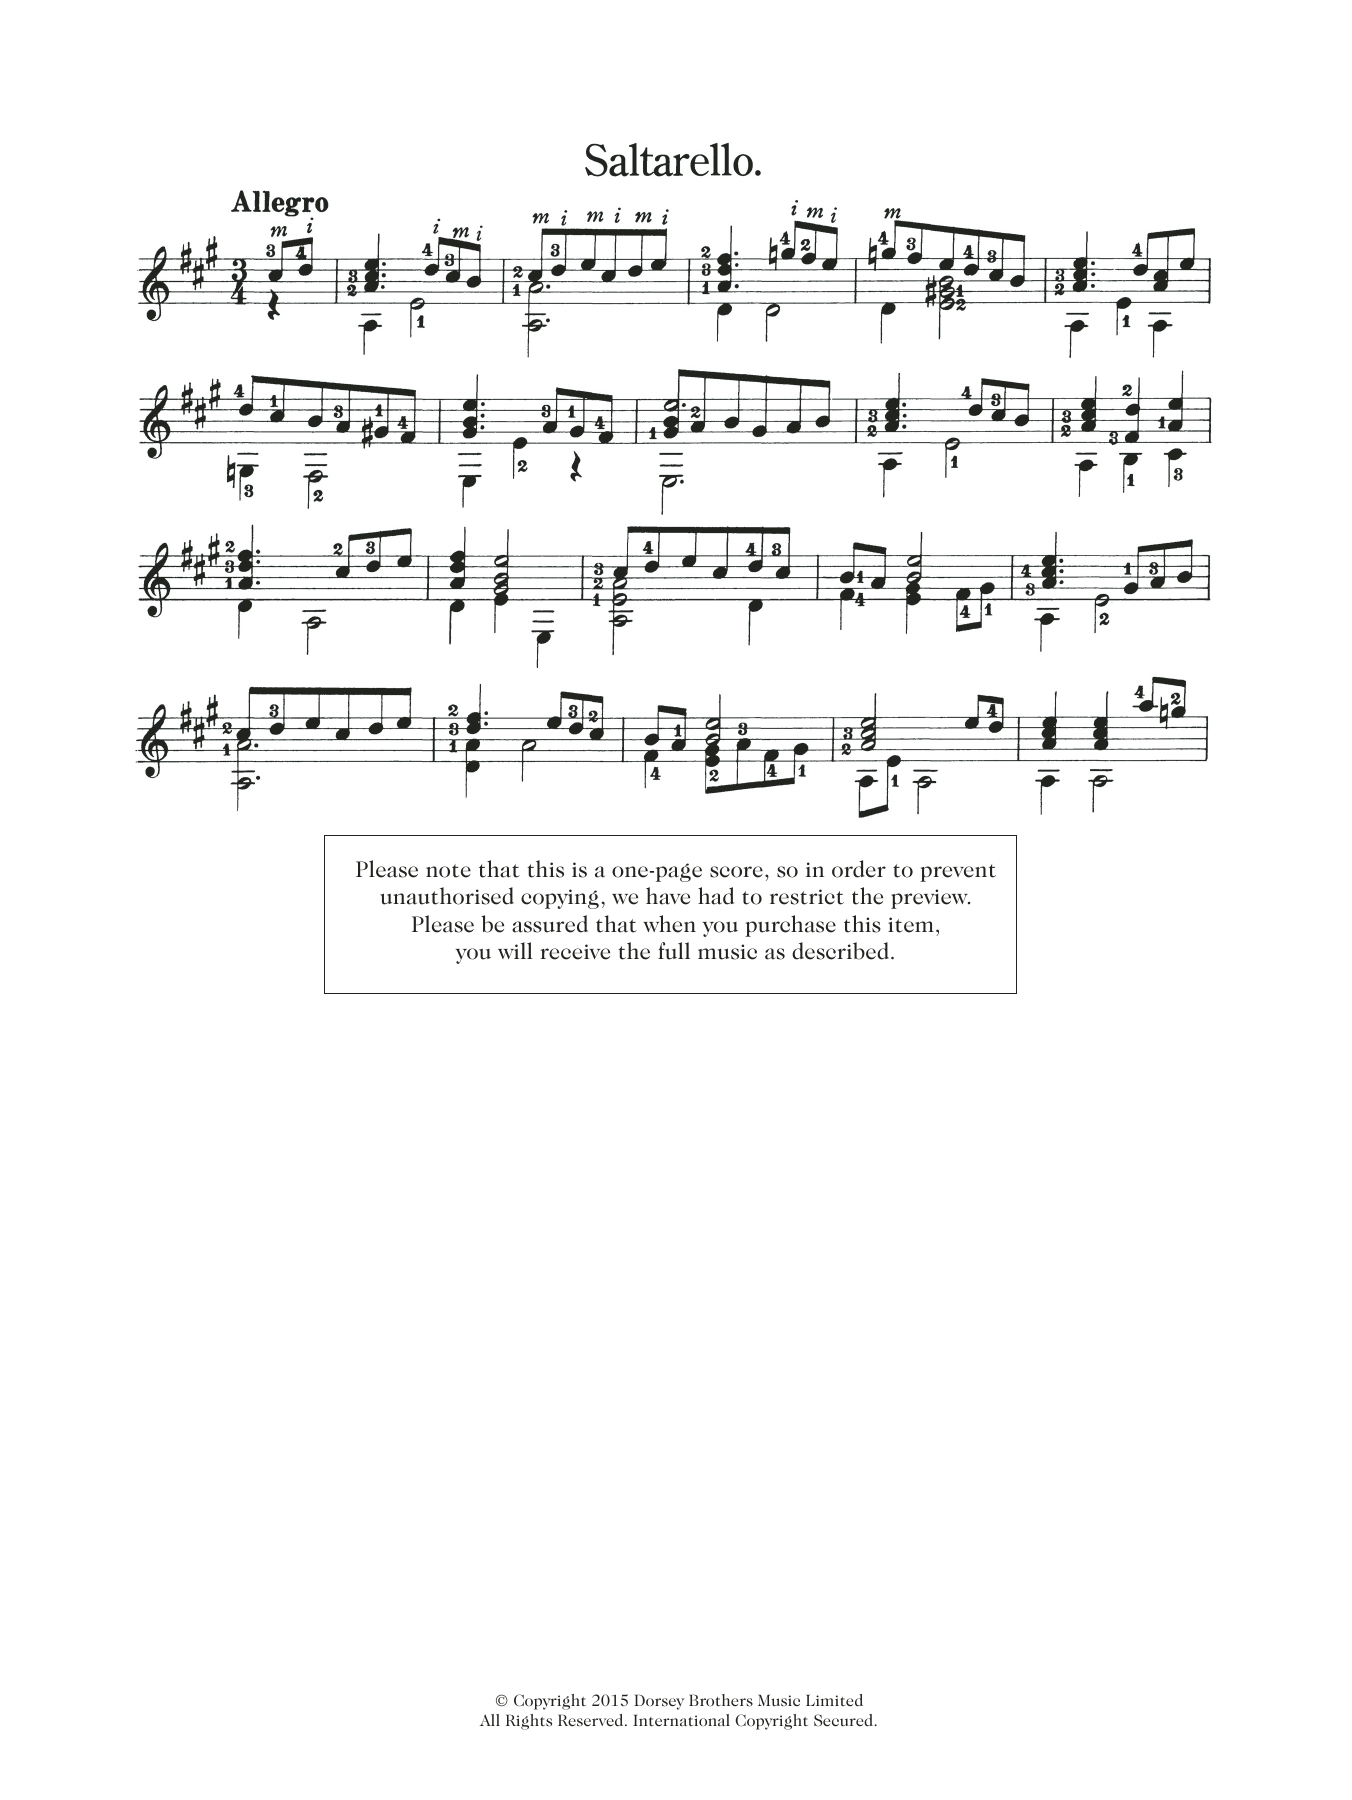 Saltarello Sheet Music